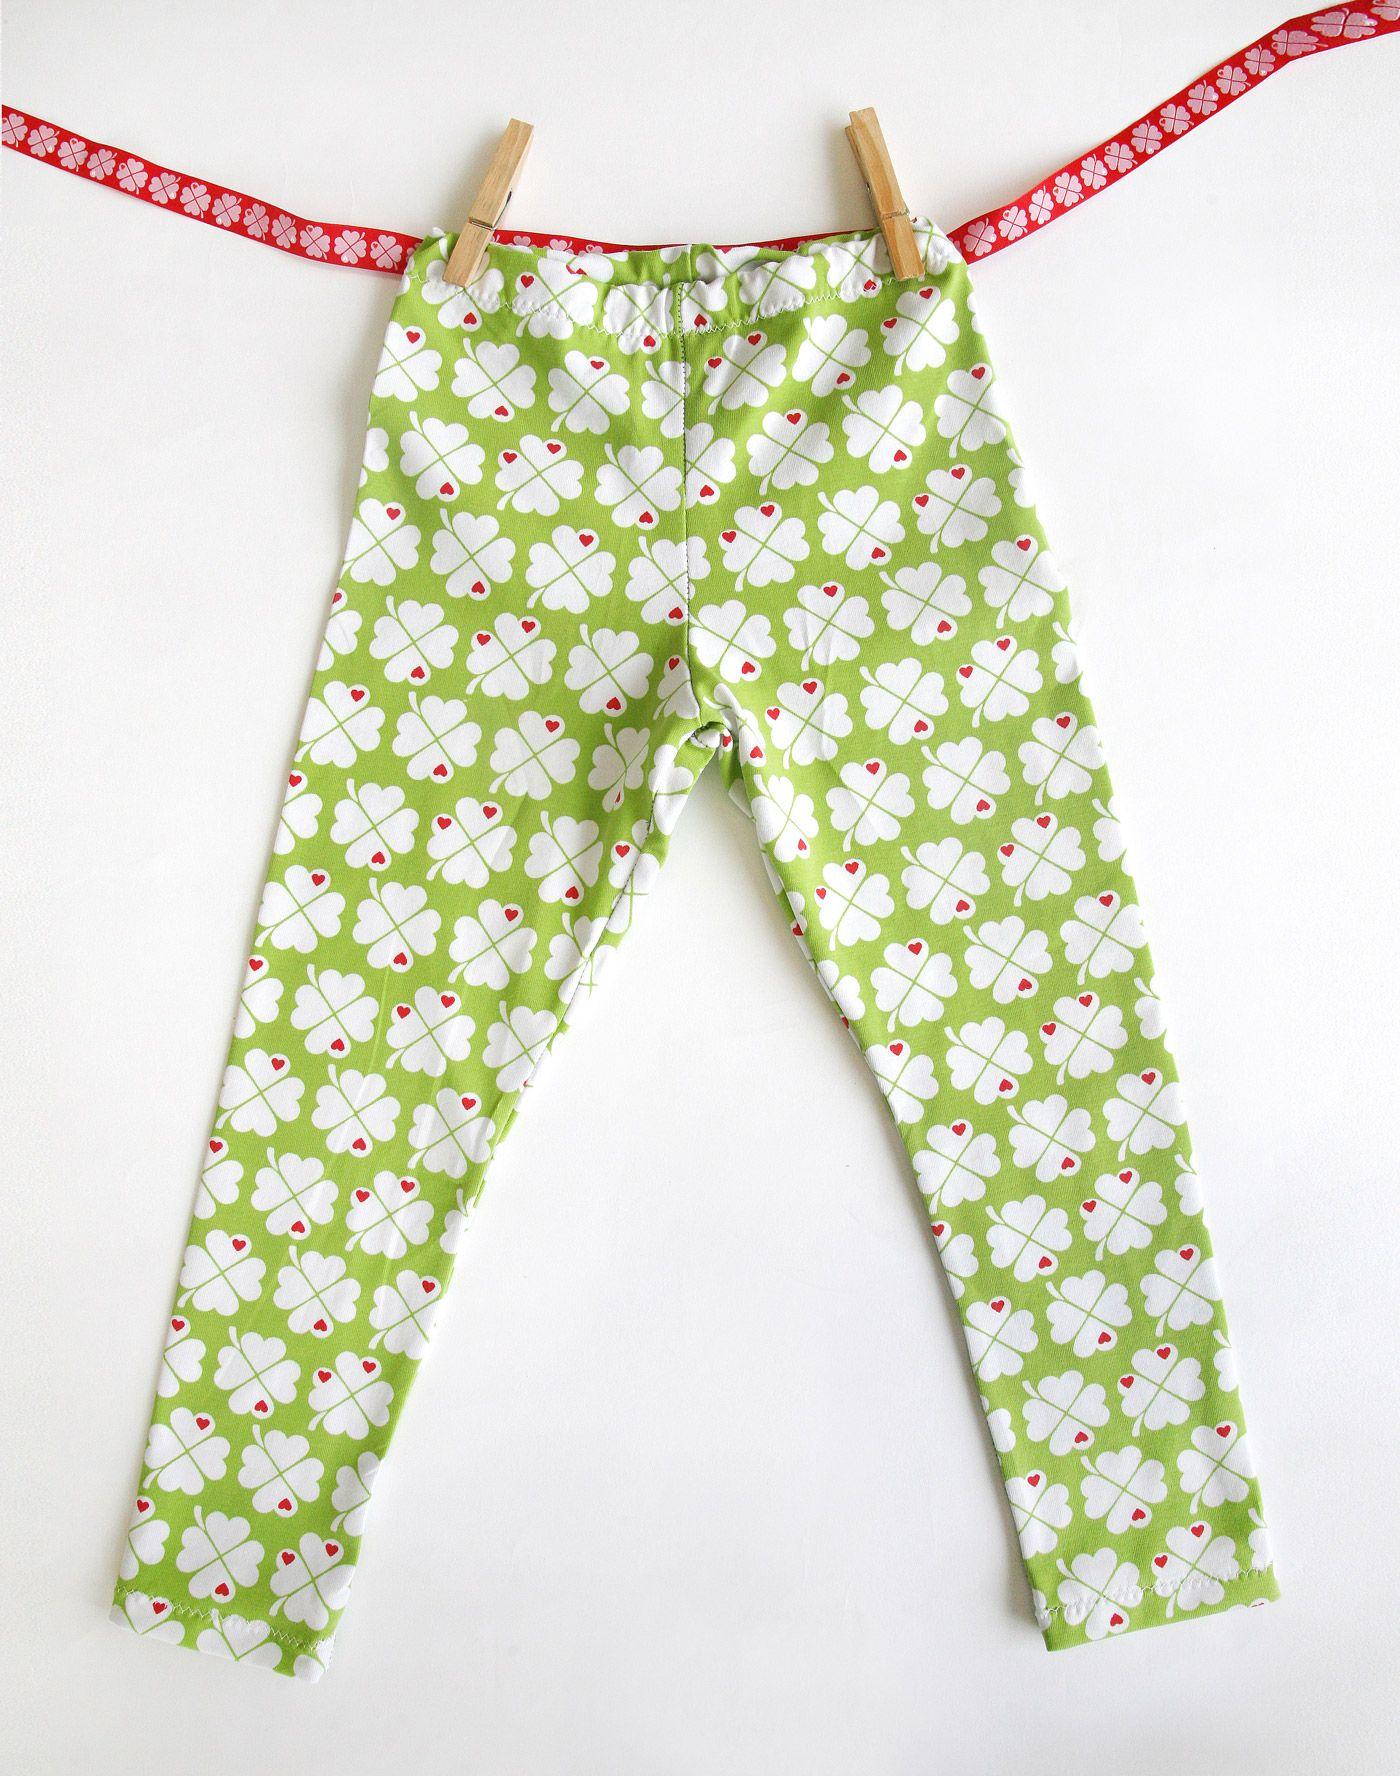 ♥ FREEBIE ♥ - Gratis Leggings Schnittmuster für Kinder